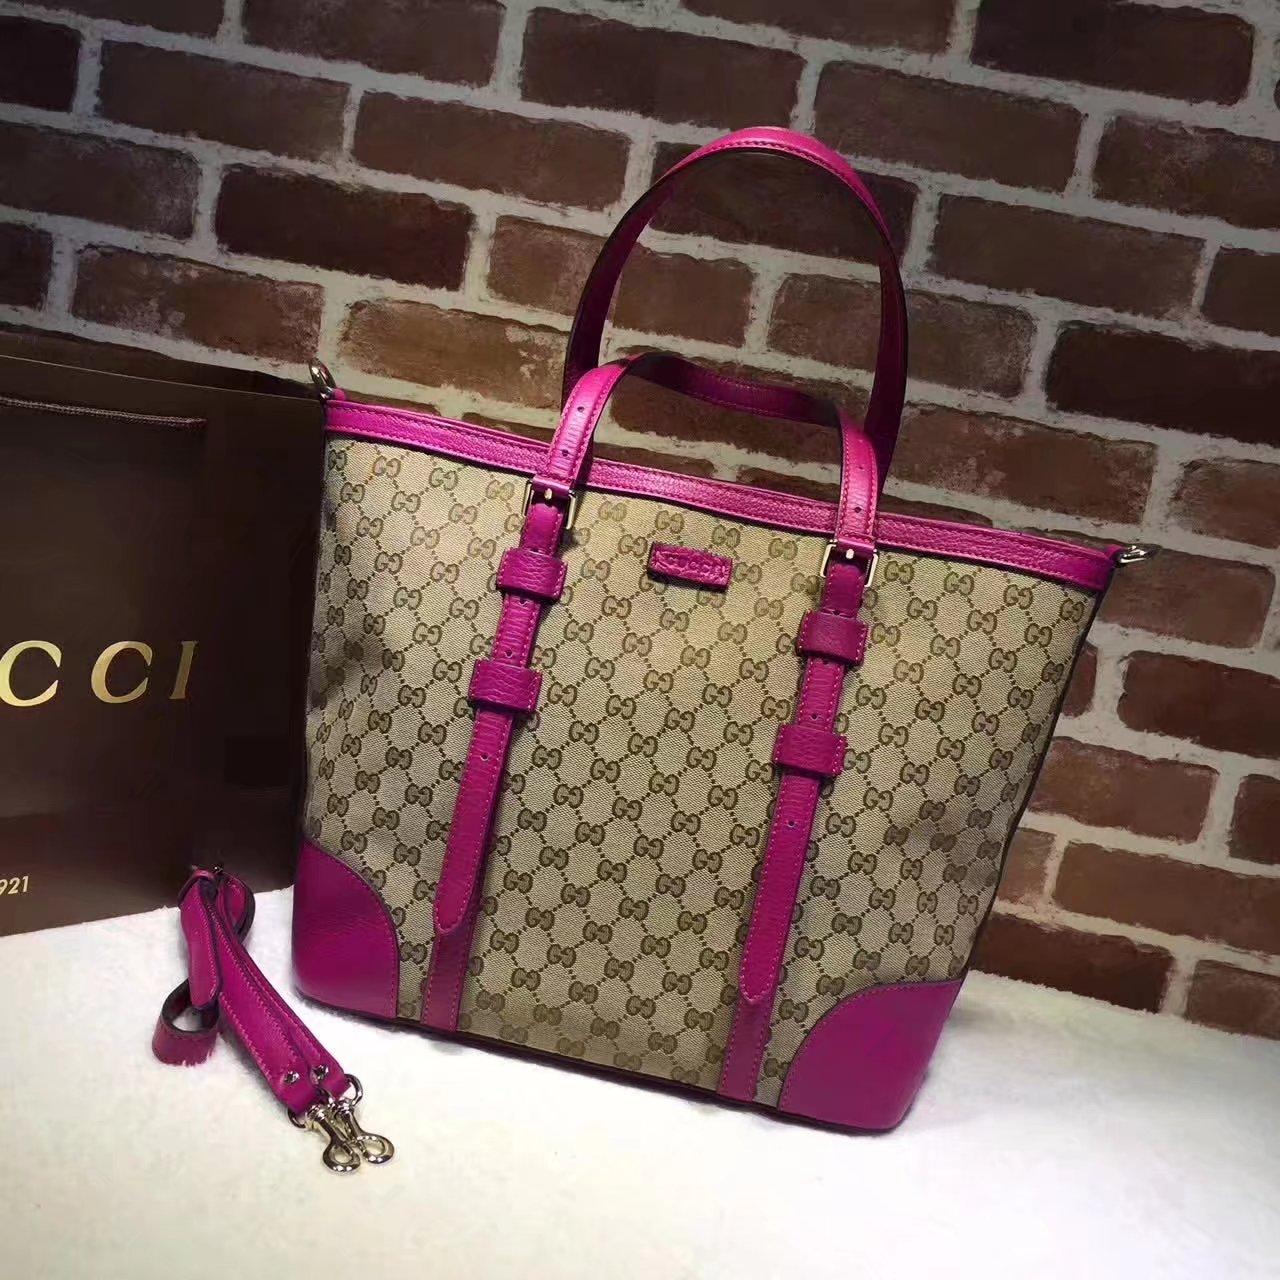 Original Gucci 387602 GG Supreme Women Tote Bag Pink